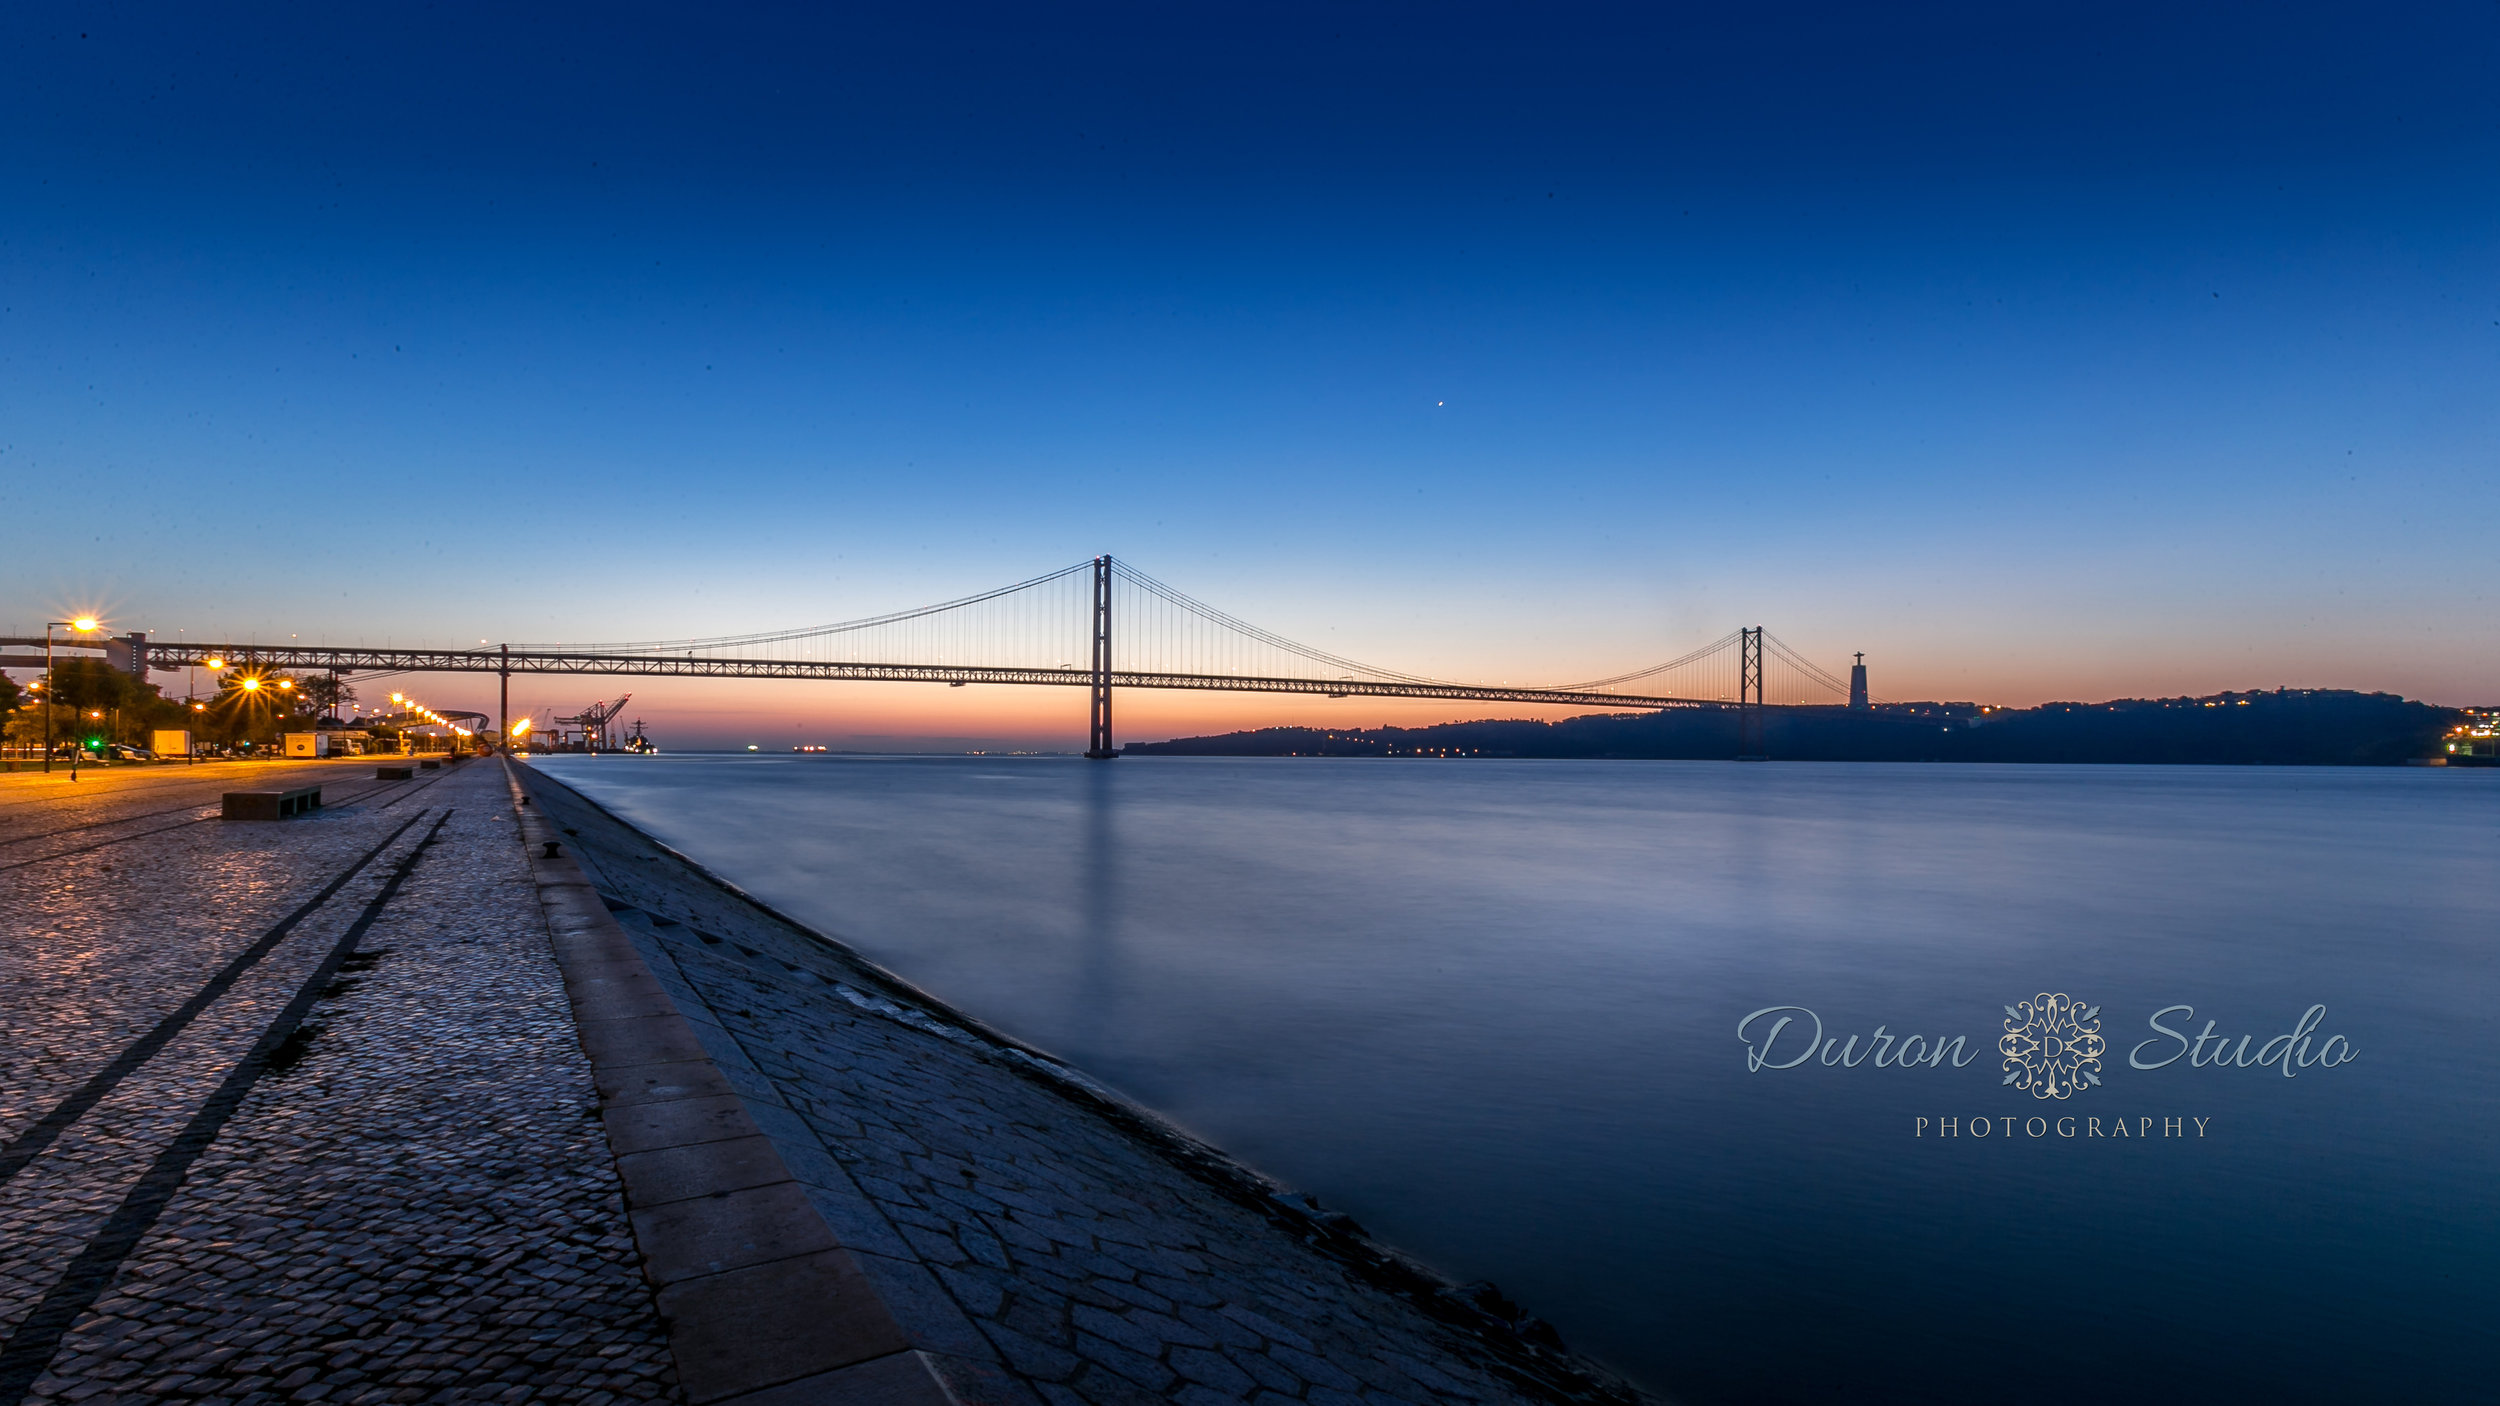 Pointof25ofApril_Bridge_Lisbon  WL.jpg